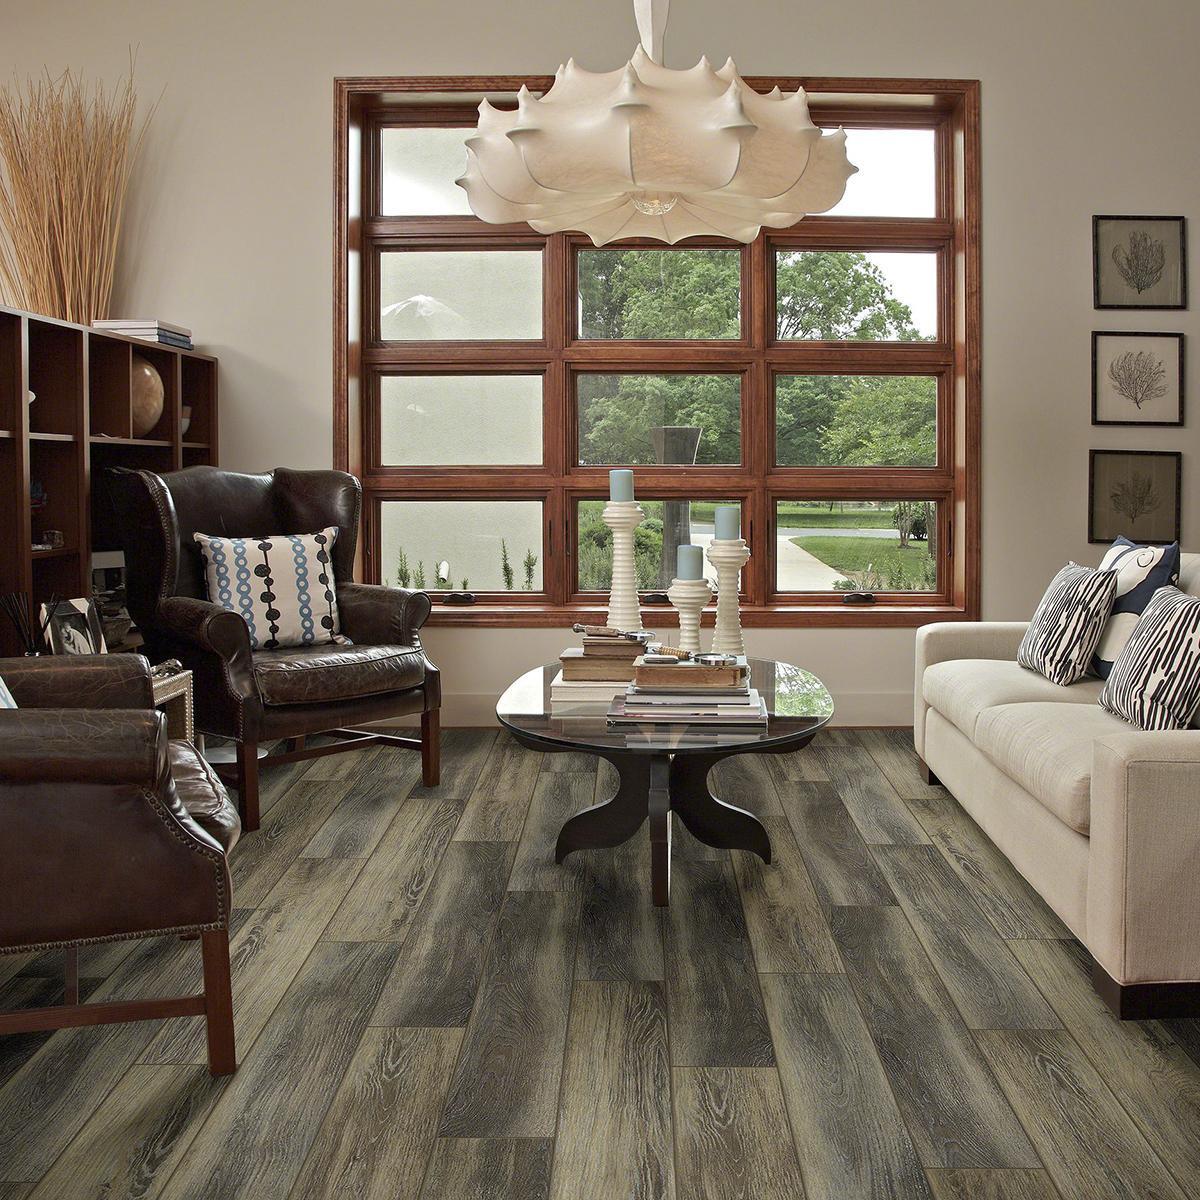 hardwood floor supply dallas of shaw tivoli plus sabbia 7 x 48 luxury vinyl tile nebraska regarding product image 0 product image 1